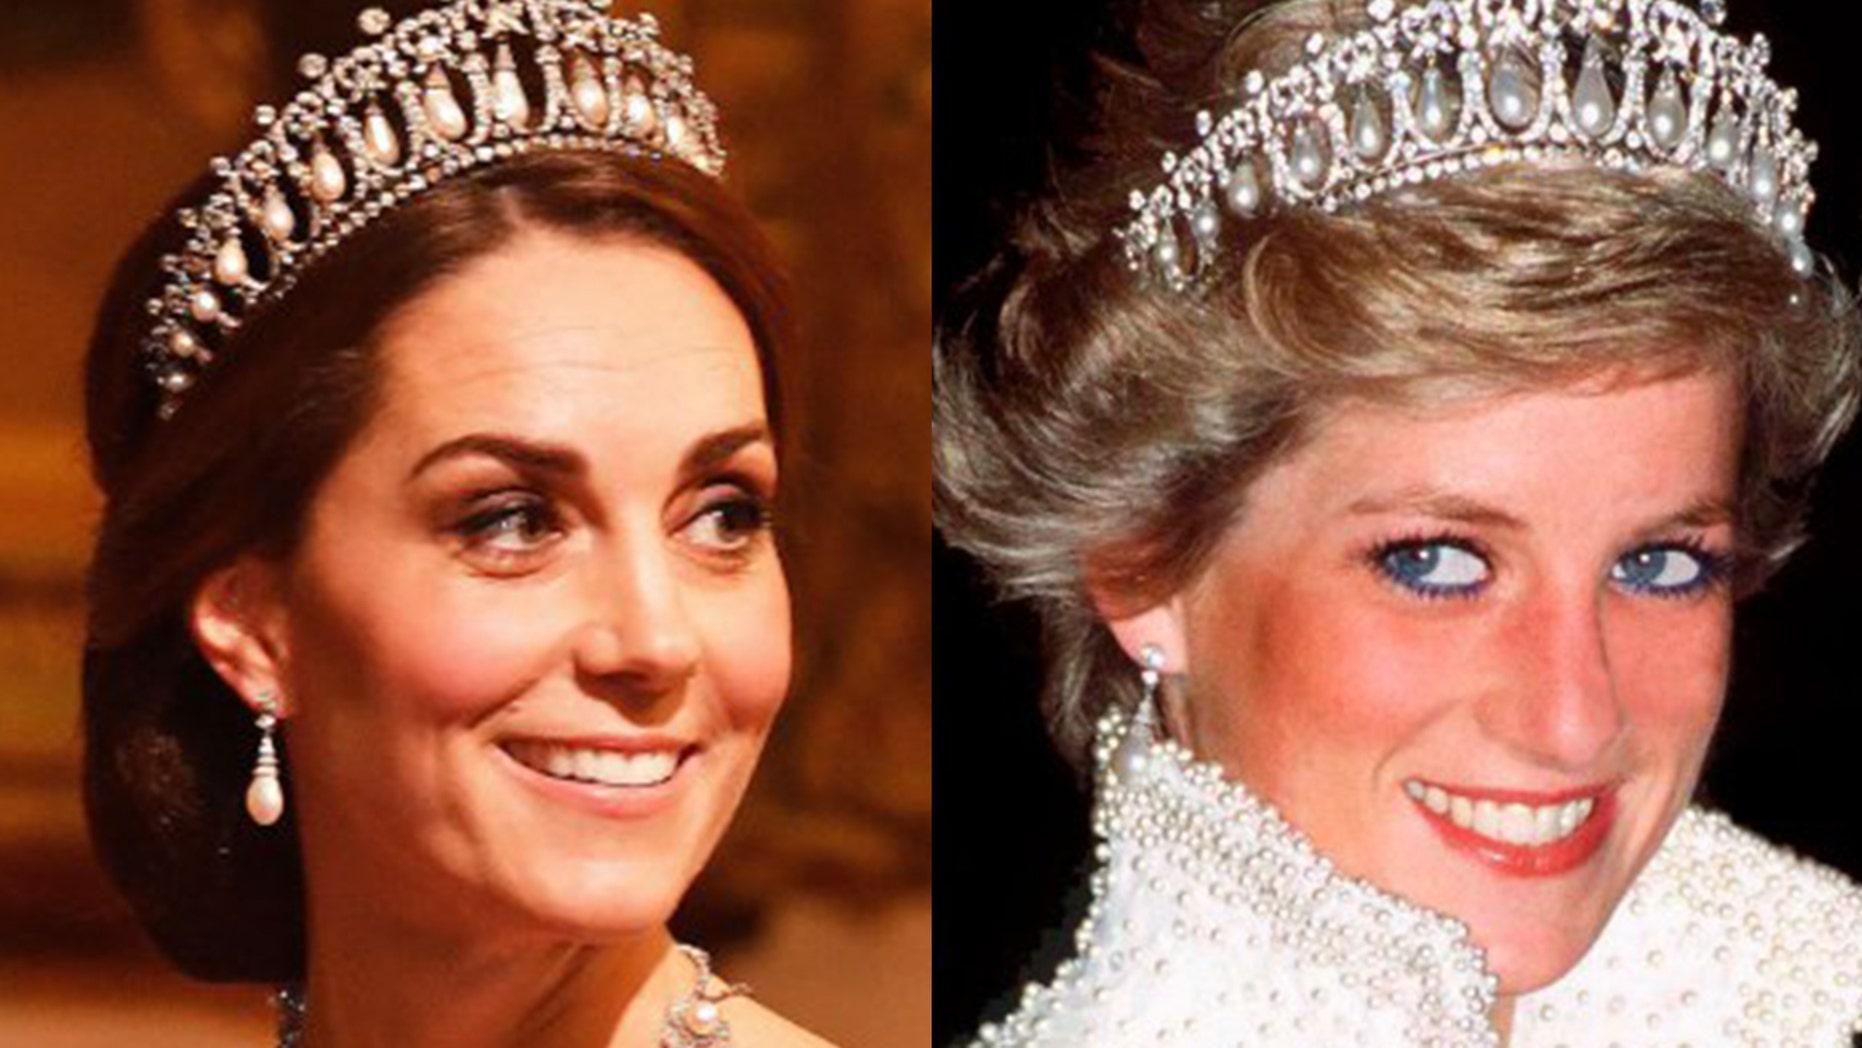 Kate Middleton Wears Princess Dianas Lovers Knot Tiara Kate Middleton Wears Princess Dianas Lovers Knot Tiara new foto